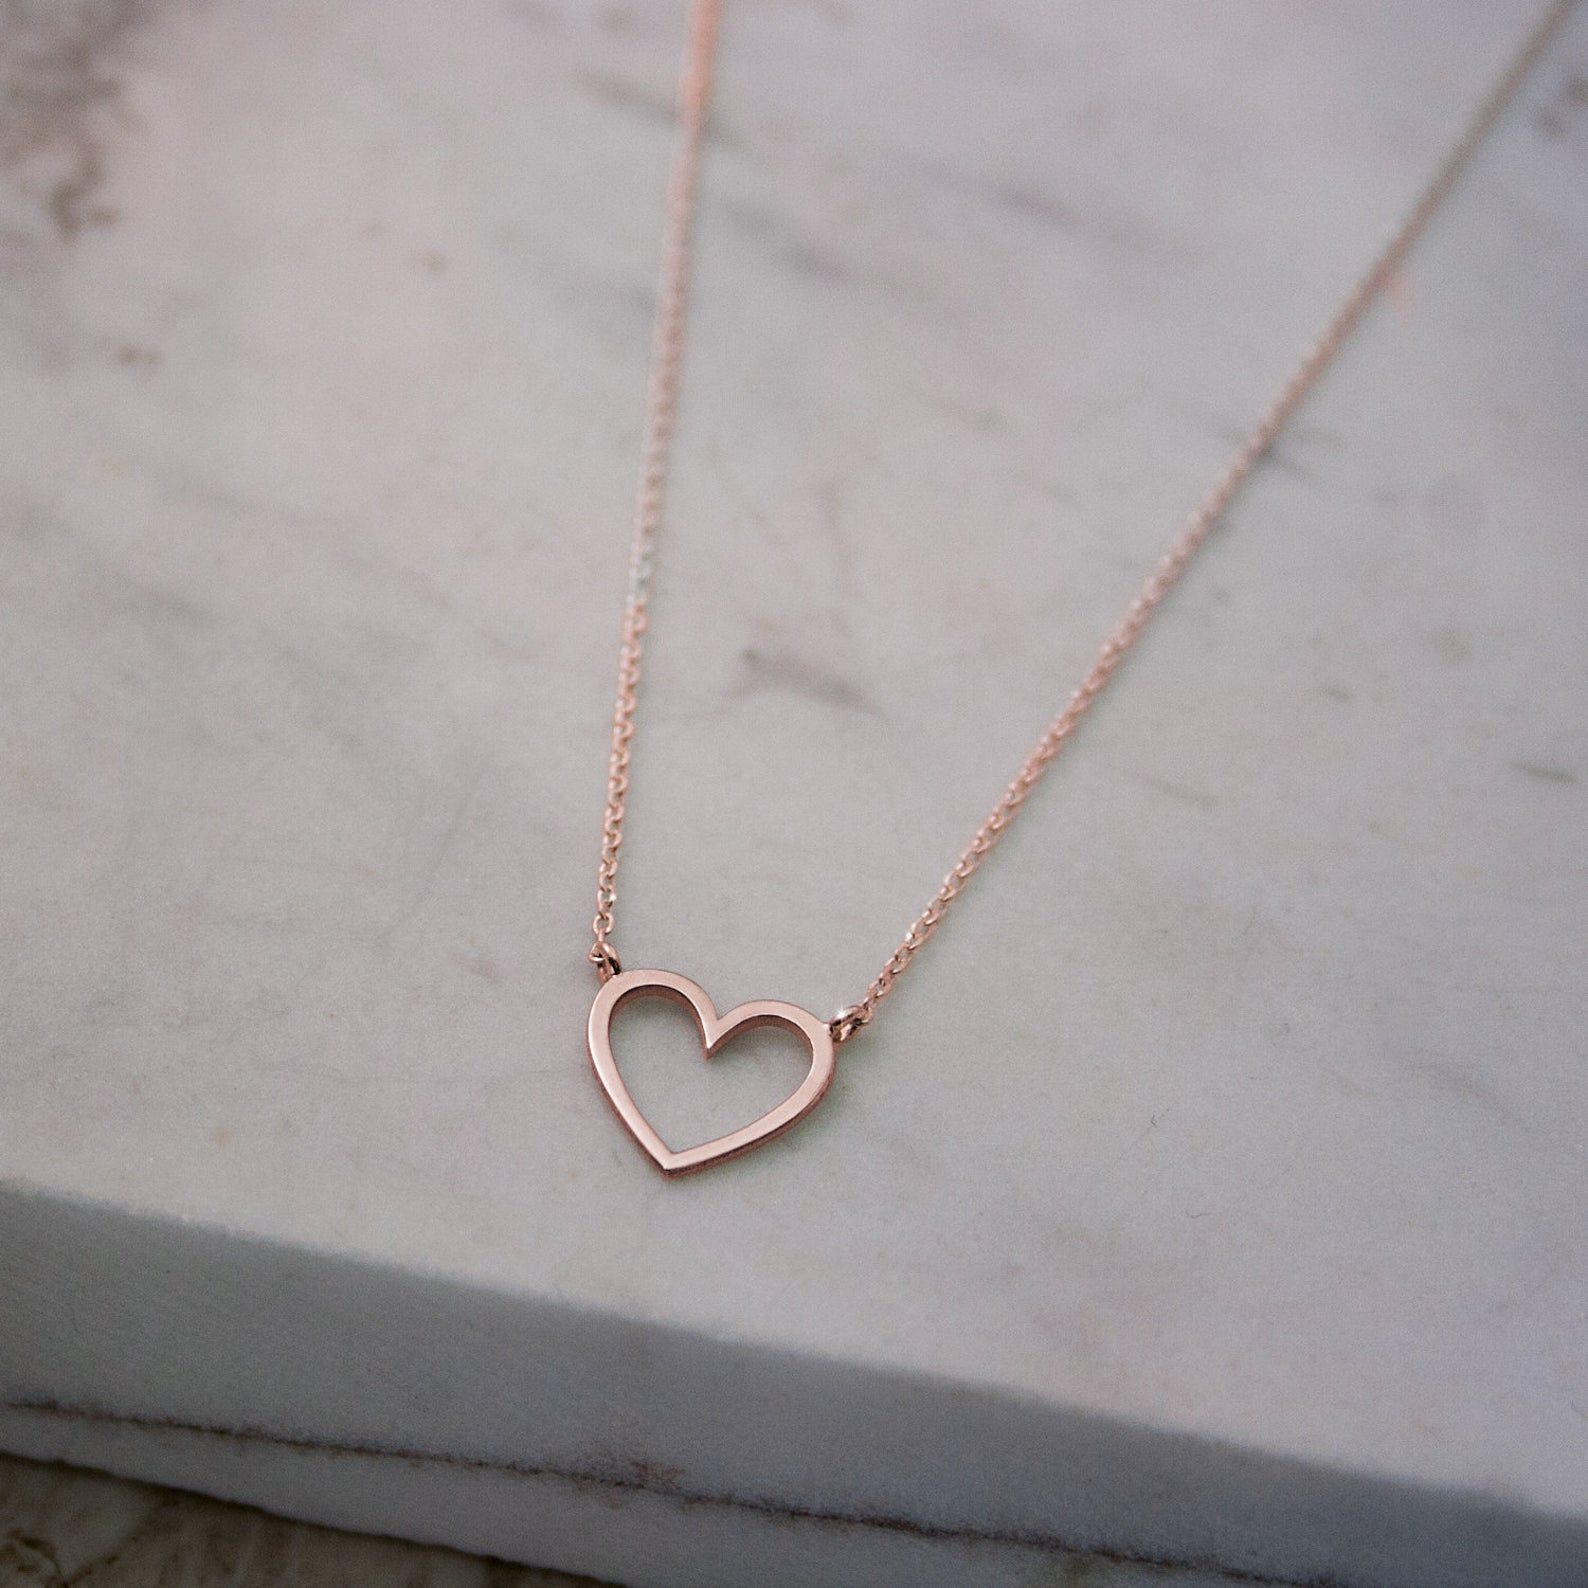 Solid Gold Heart Necklace Rose Gold Heart 9k 14k 18k Gold Etsy Gold Heart Necklace Initial Necklace Gold Rose Gold Heart